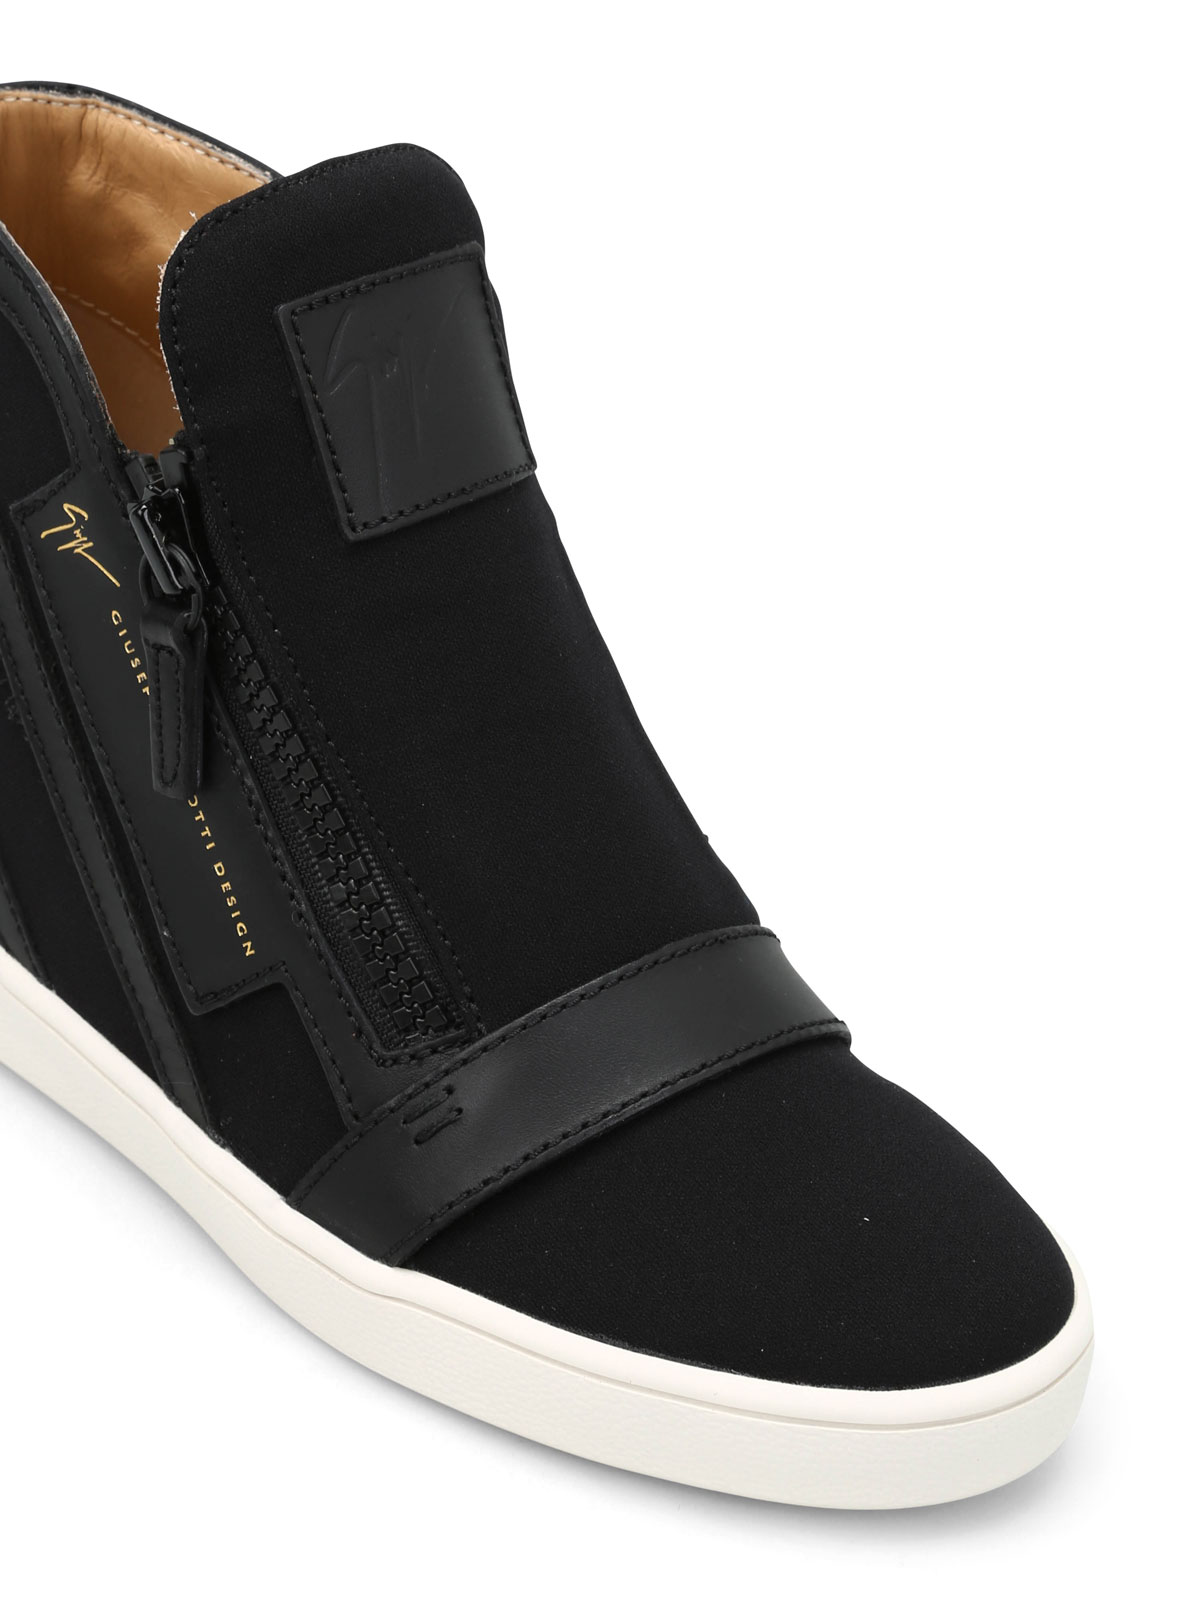 online store 888d3 4d777 Giuseppe Zanotti - Sneaker con rialzo interno in pelle ...